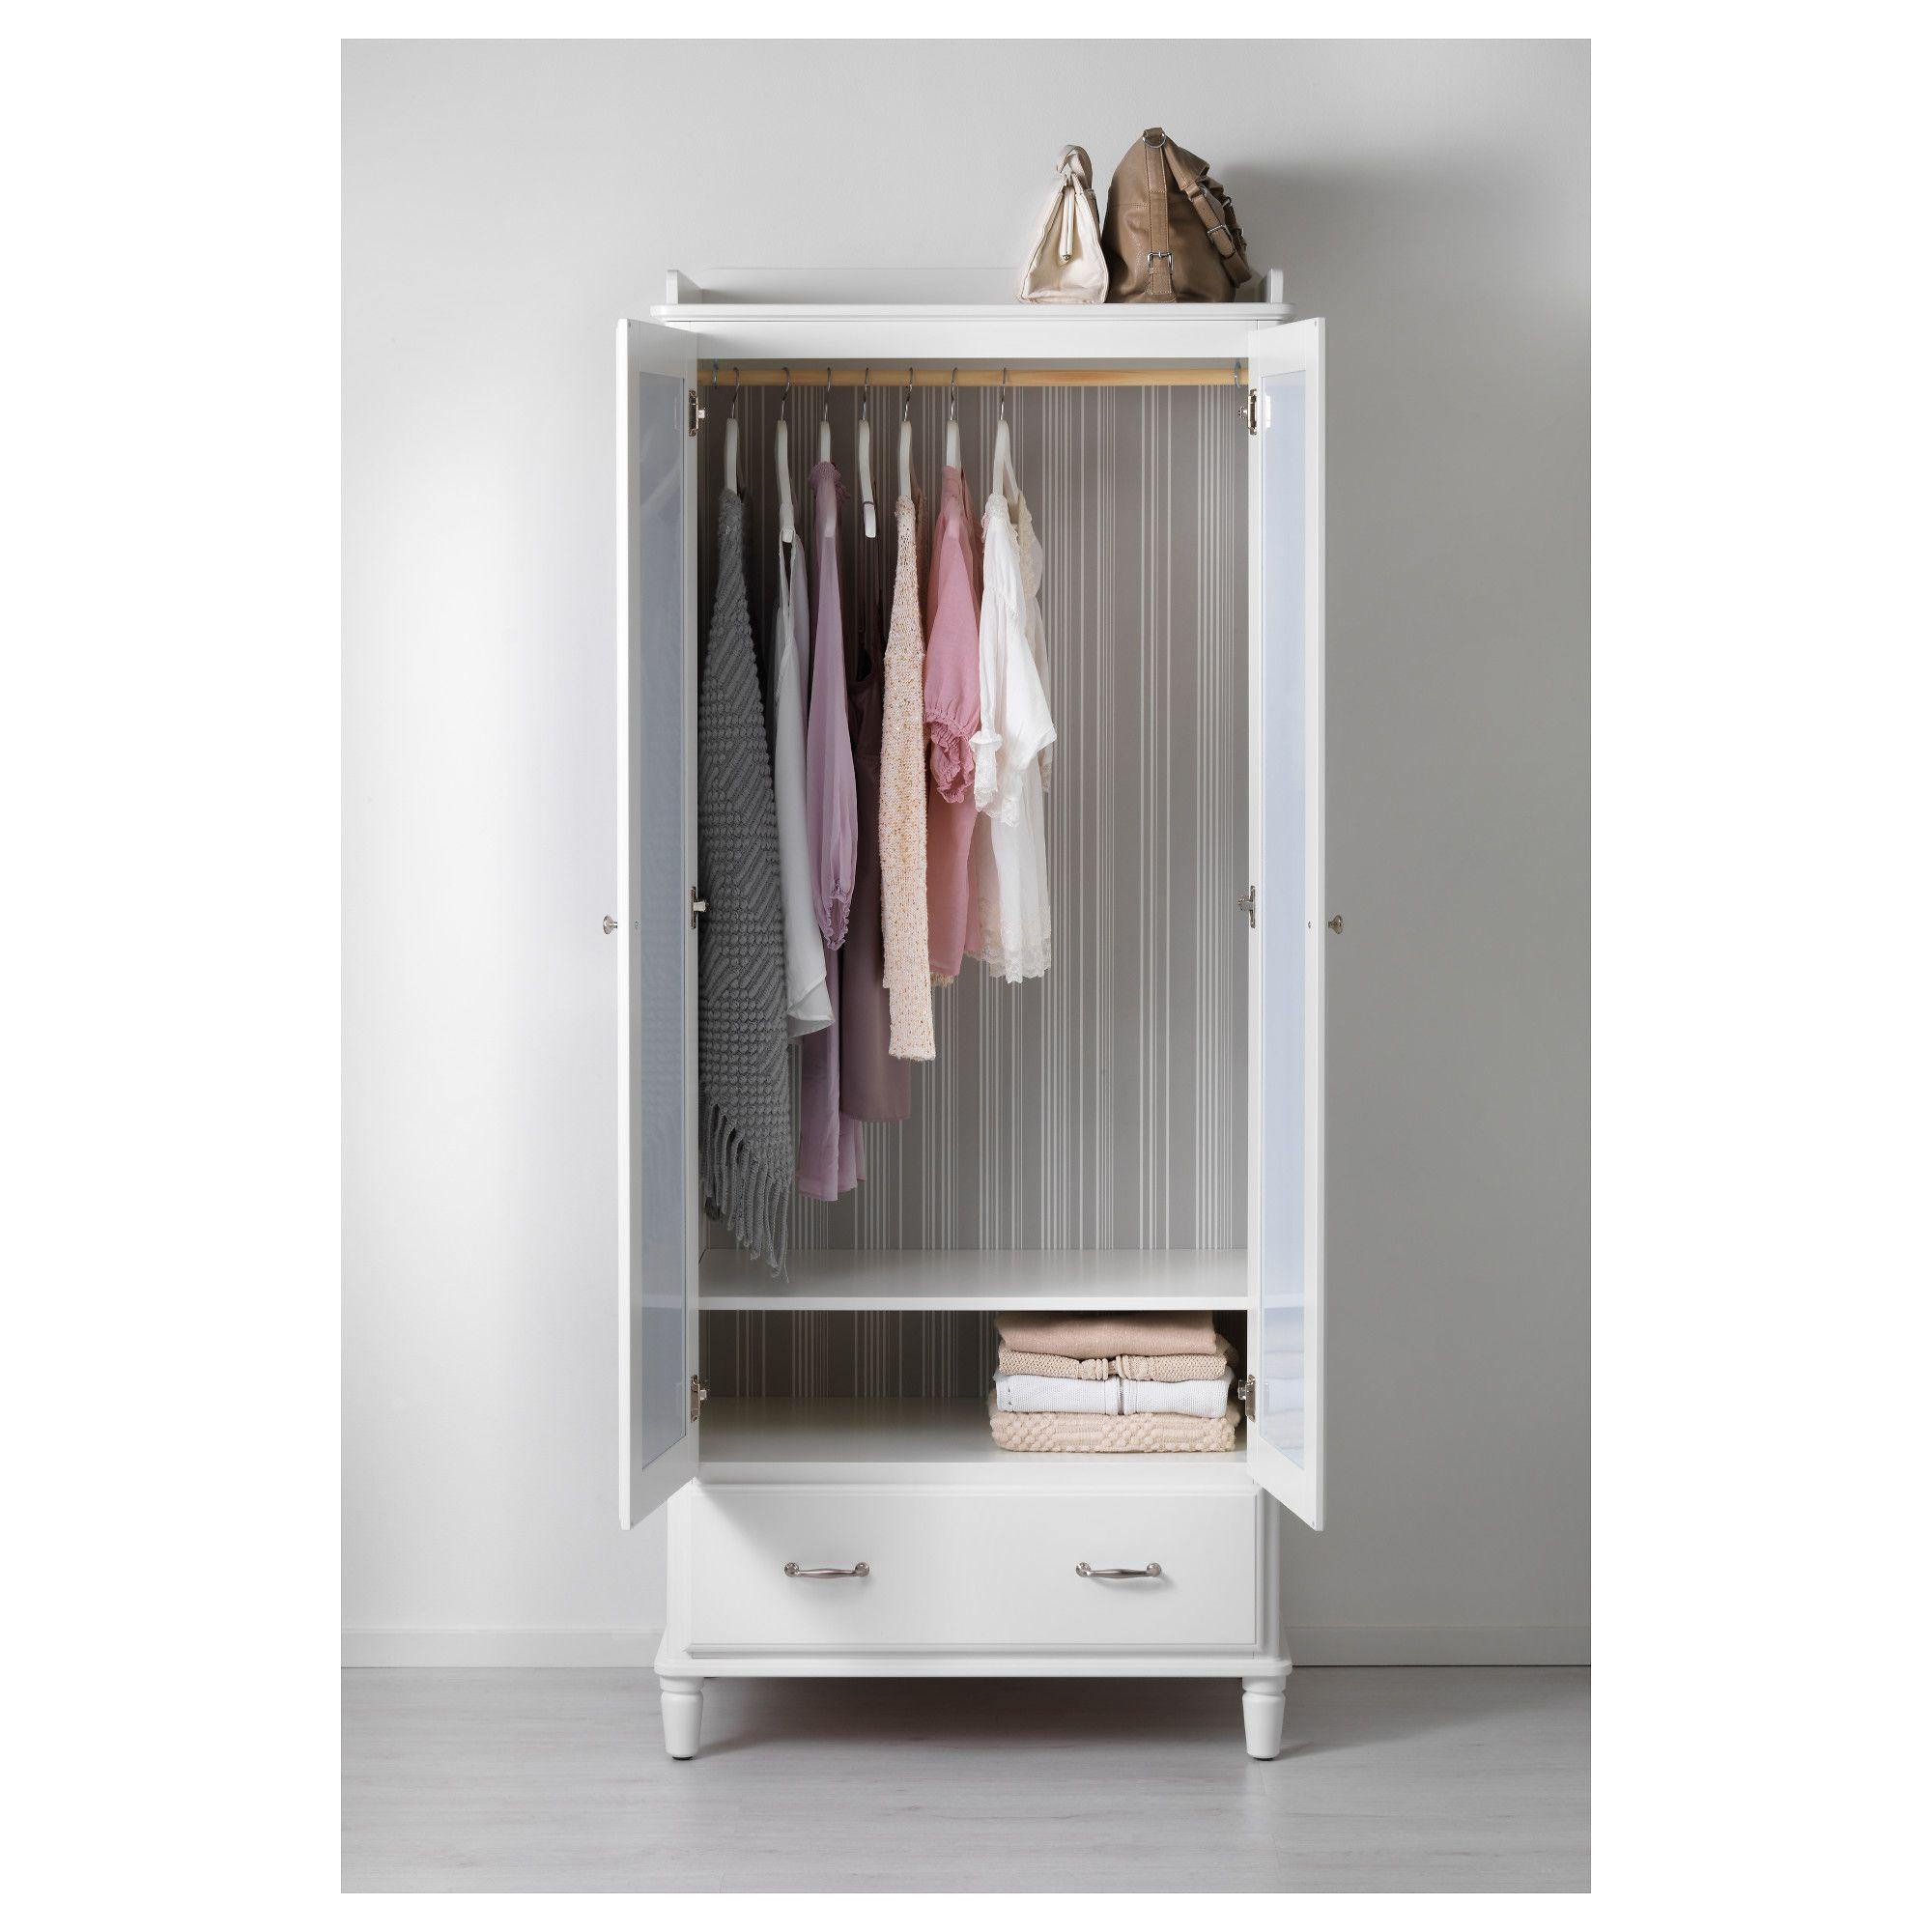 New Bedroom Plan WardrobeWhiteMirror GlassAaa Design Tyssedal W9IEHD2